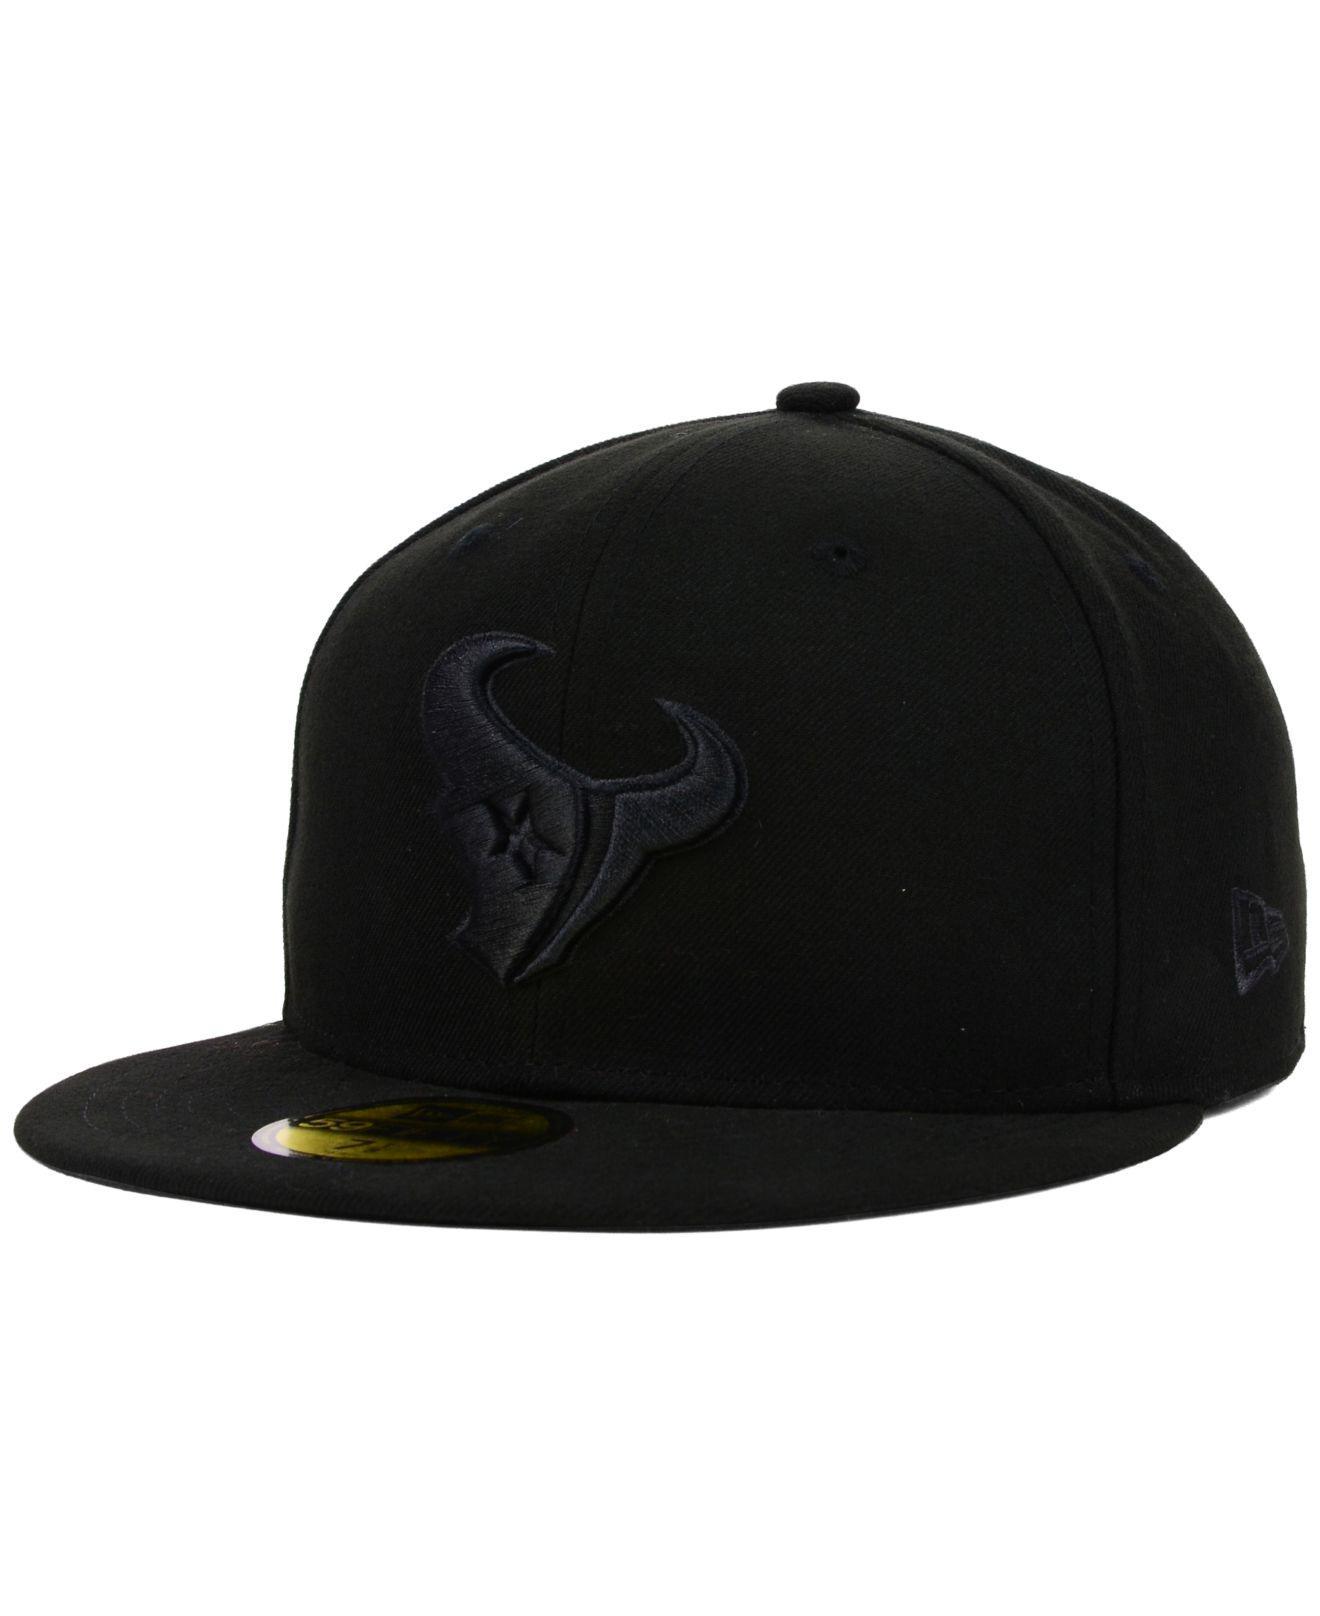 KTZ - Houston Texans Nfl Black On Black 59fifty Cap for Men - Lyst. View  fullscreen 4b8fb66a5